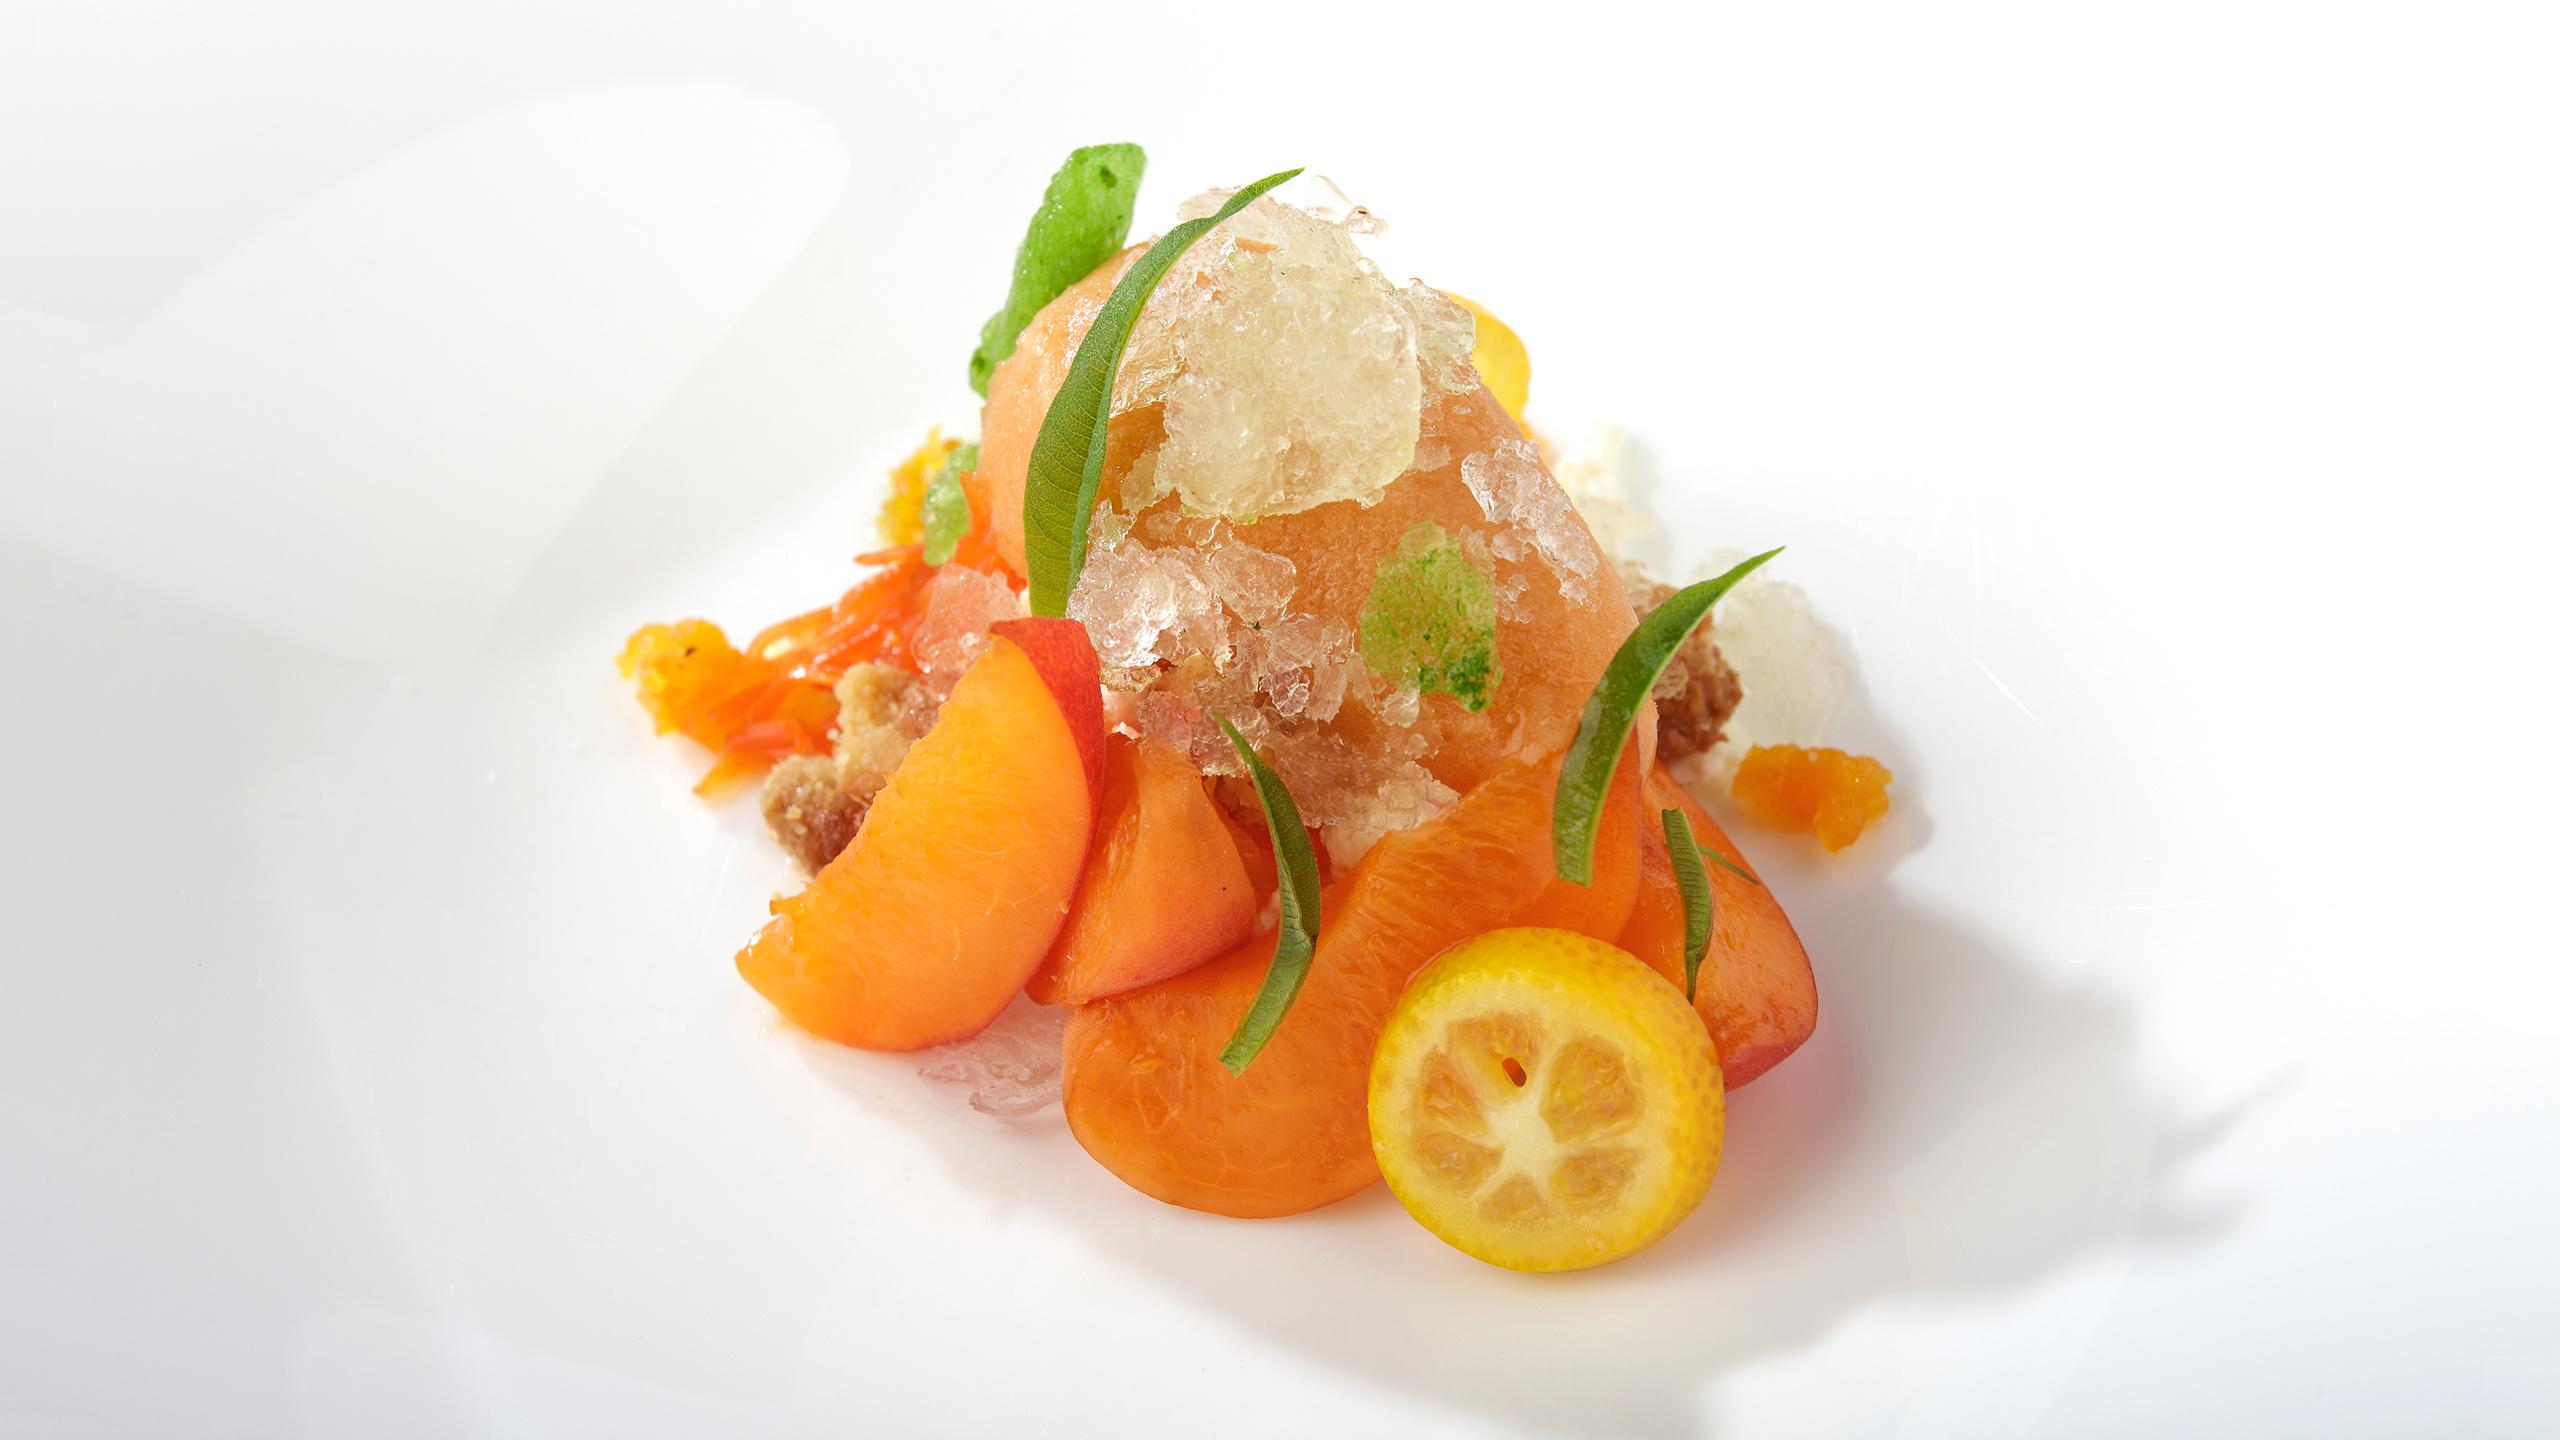 gastronomia 10 tafona